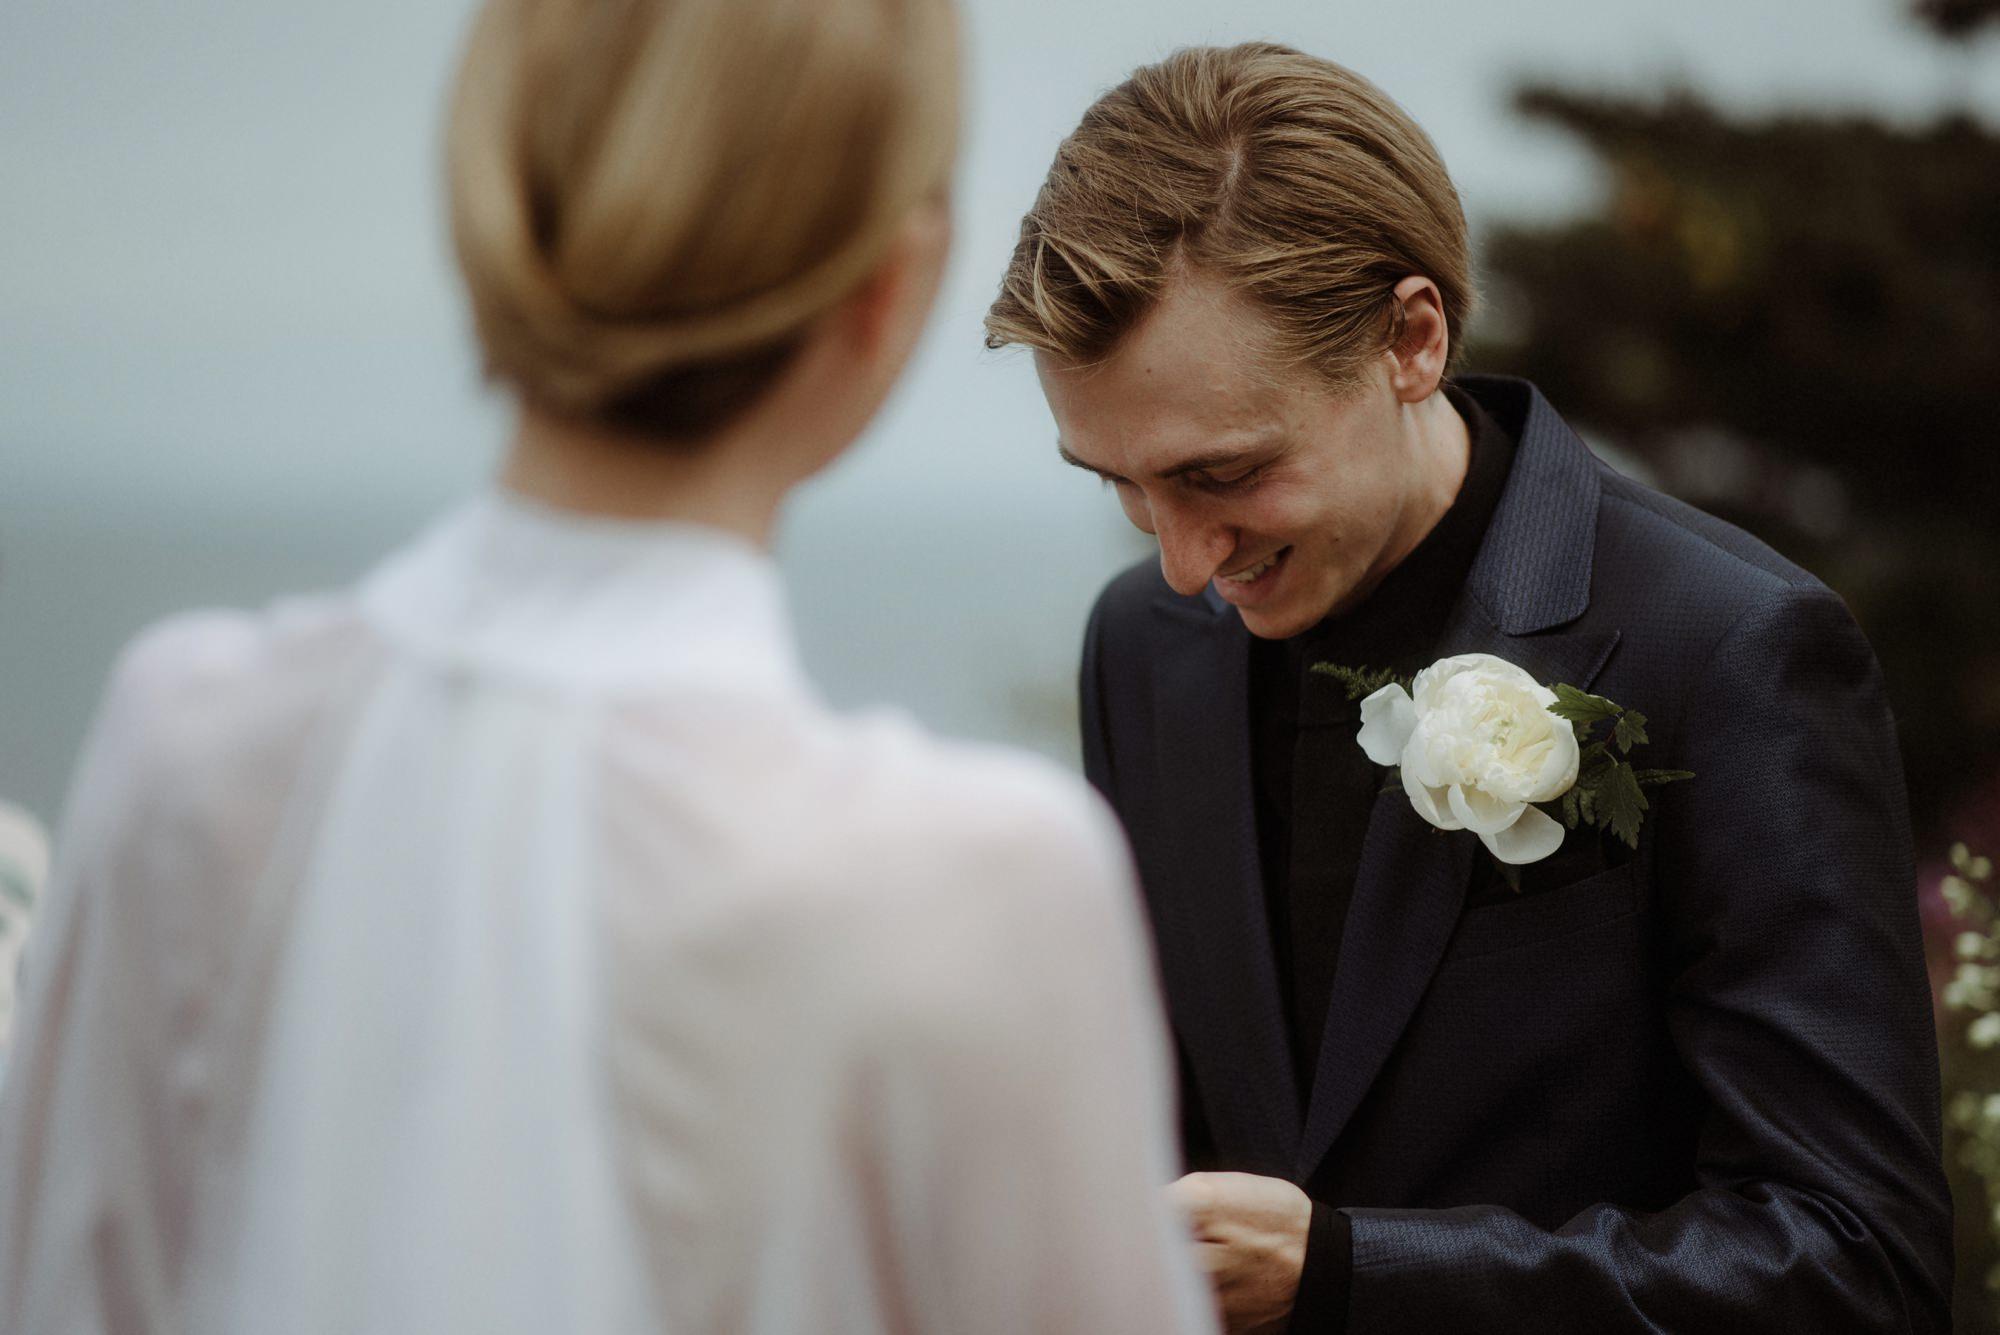 copenhagen wedding photography 0014 1